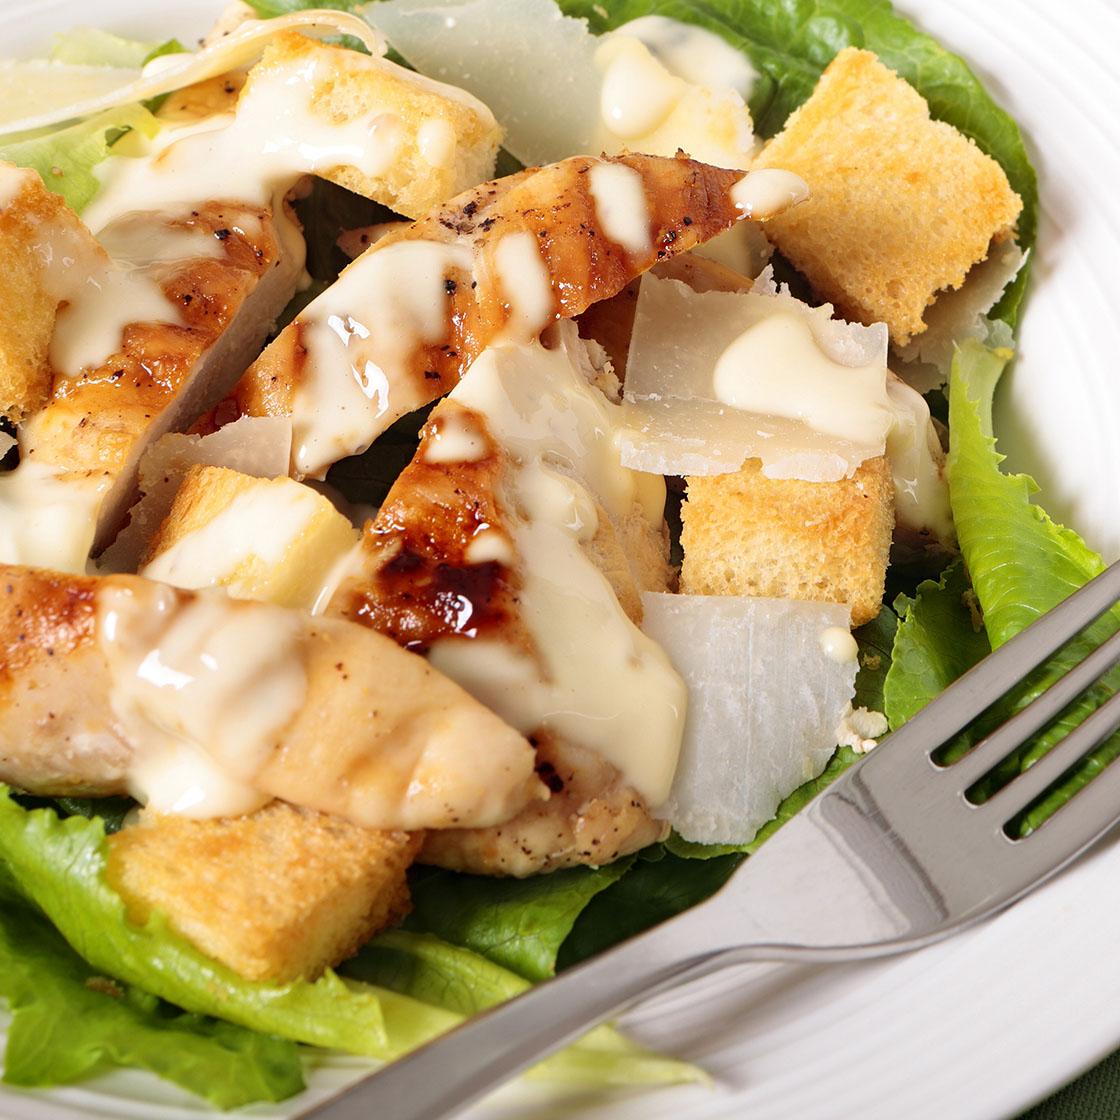 Caesar salad allégée